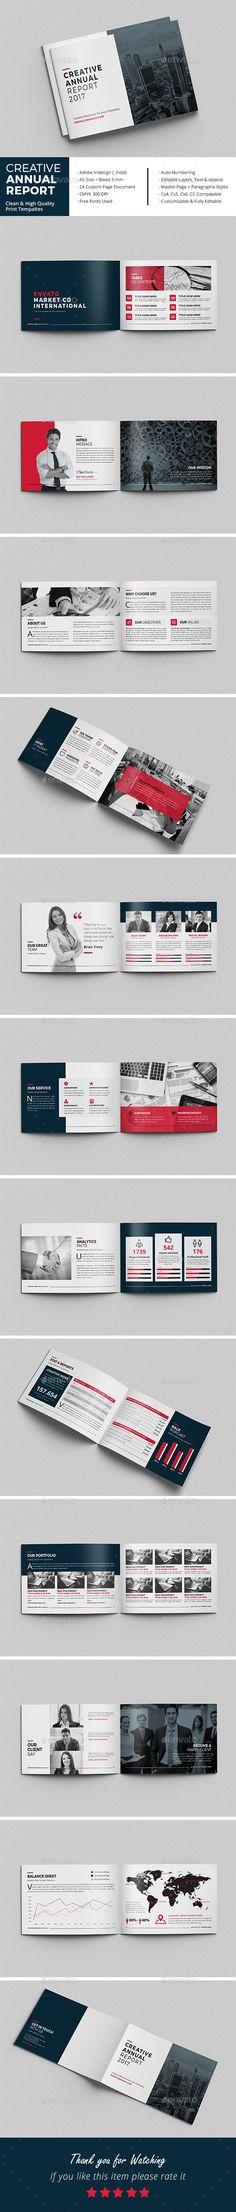 Creative Annual Report Brochure - #Corporate #Brochures Download here:  https://graphicriver.net/item/creative-annual-report-brochure/19530251?ref=alena994